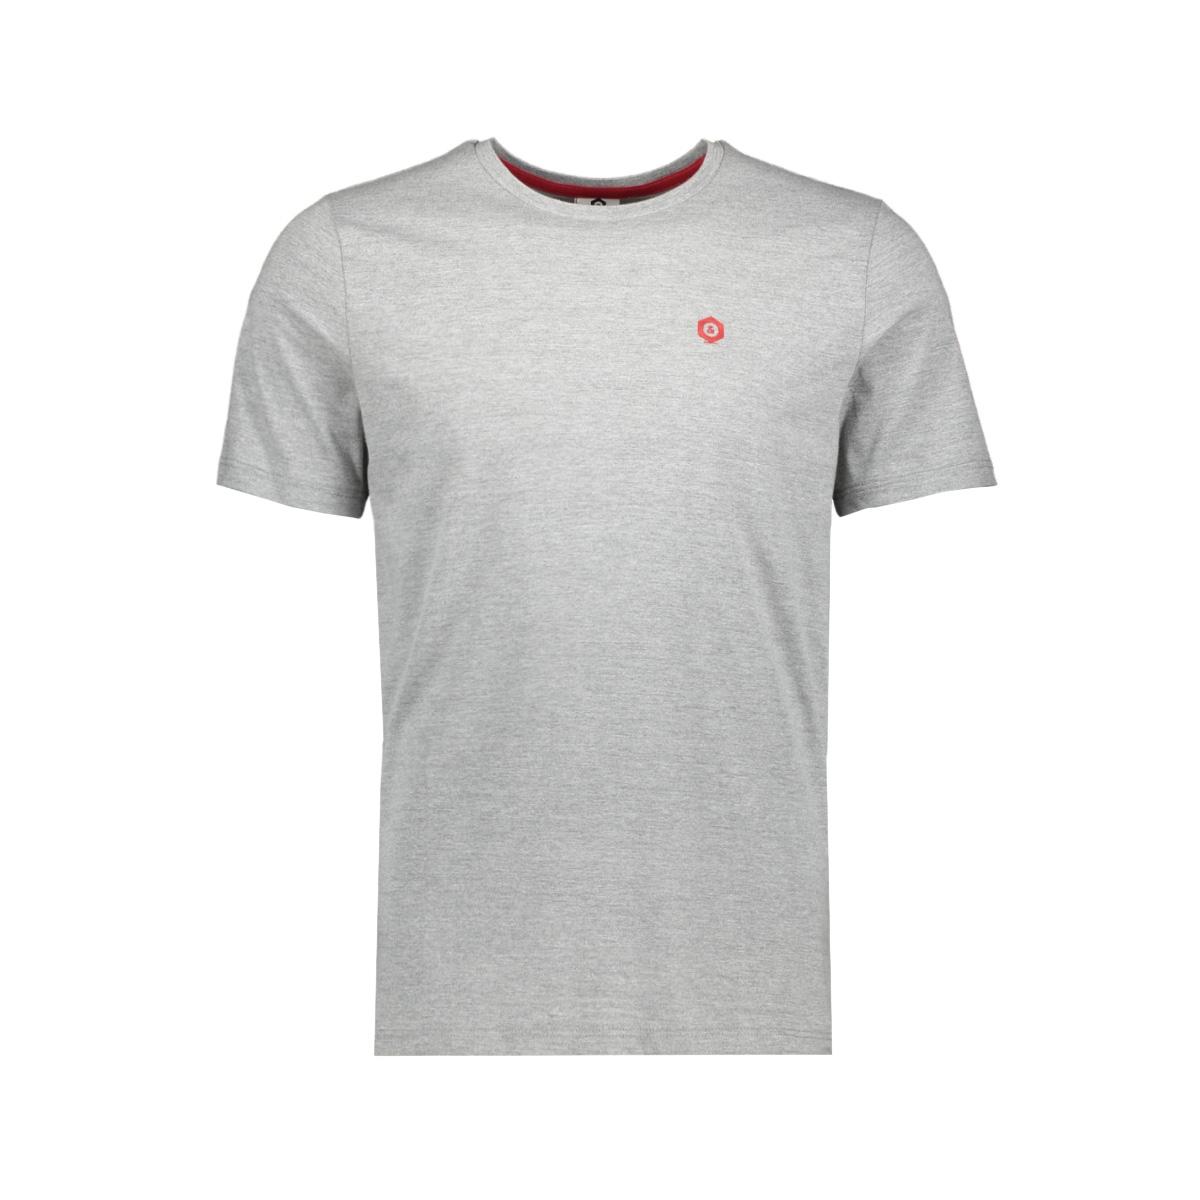 jcoboston tee ss crew neck 12156938 jack & jones t-shirt grey melange/slim